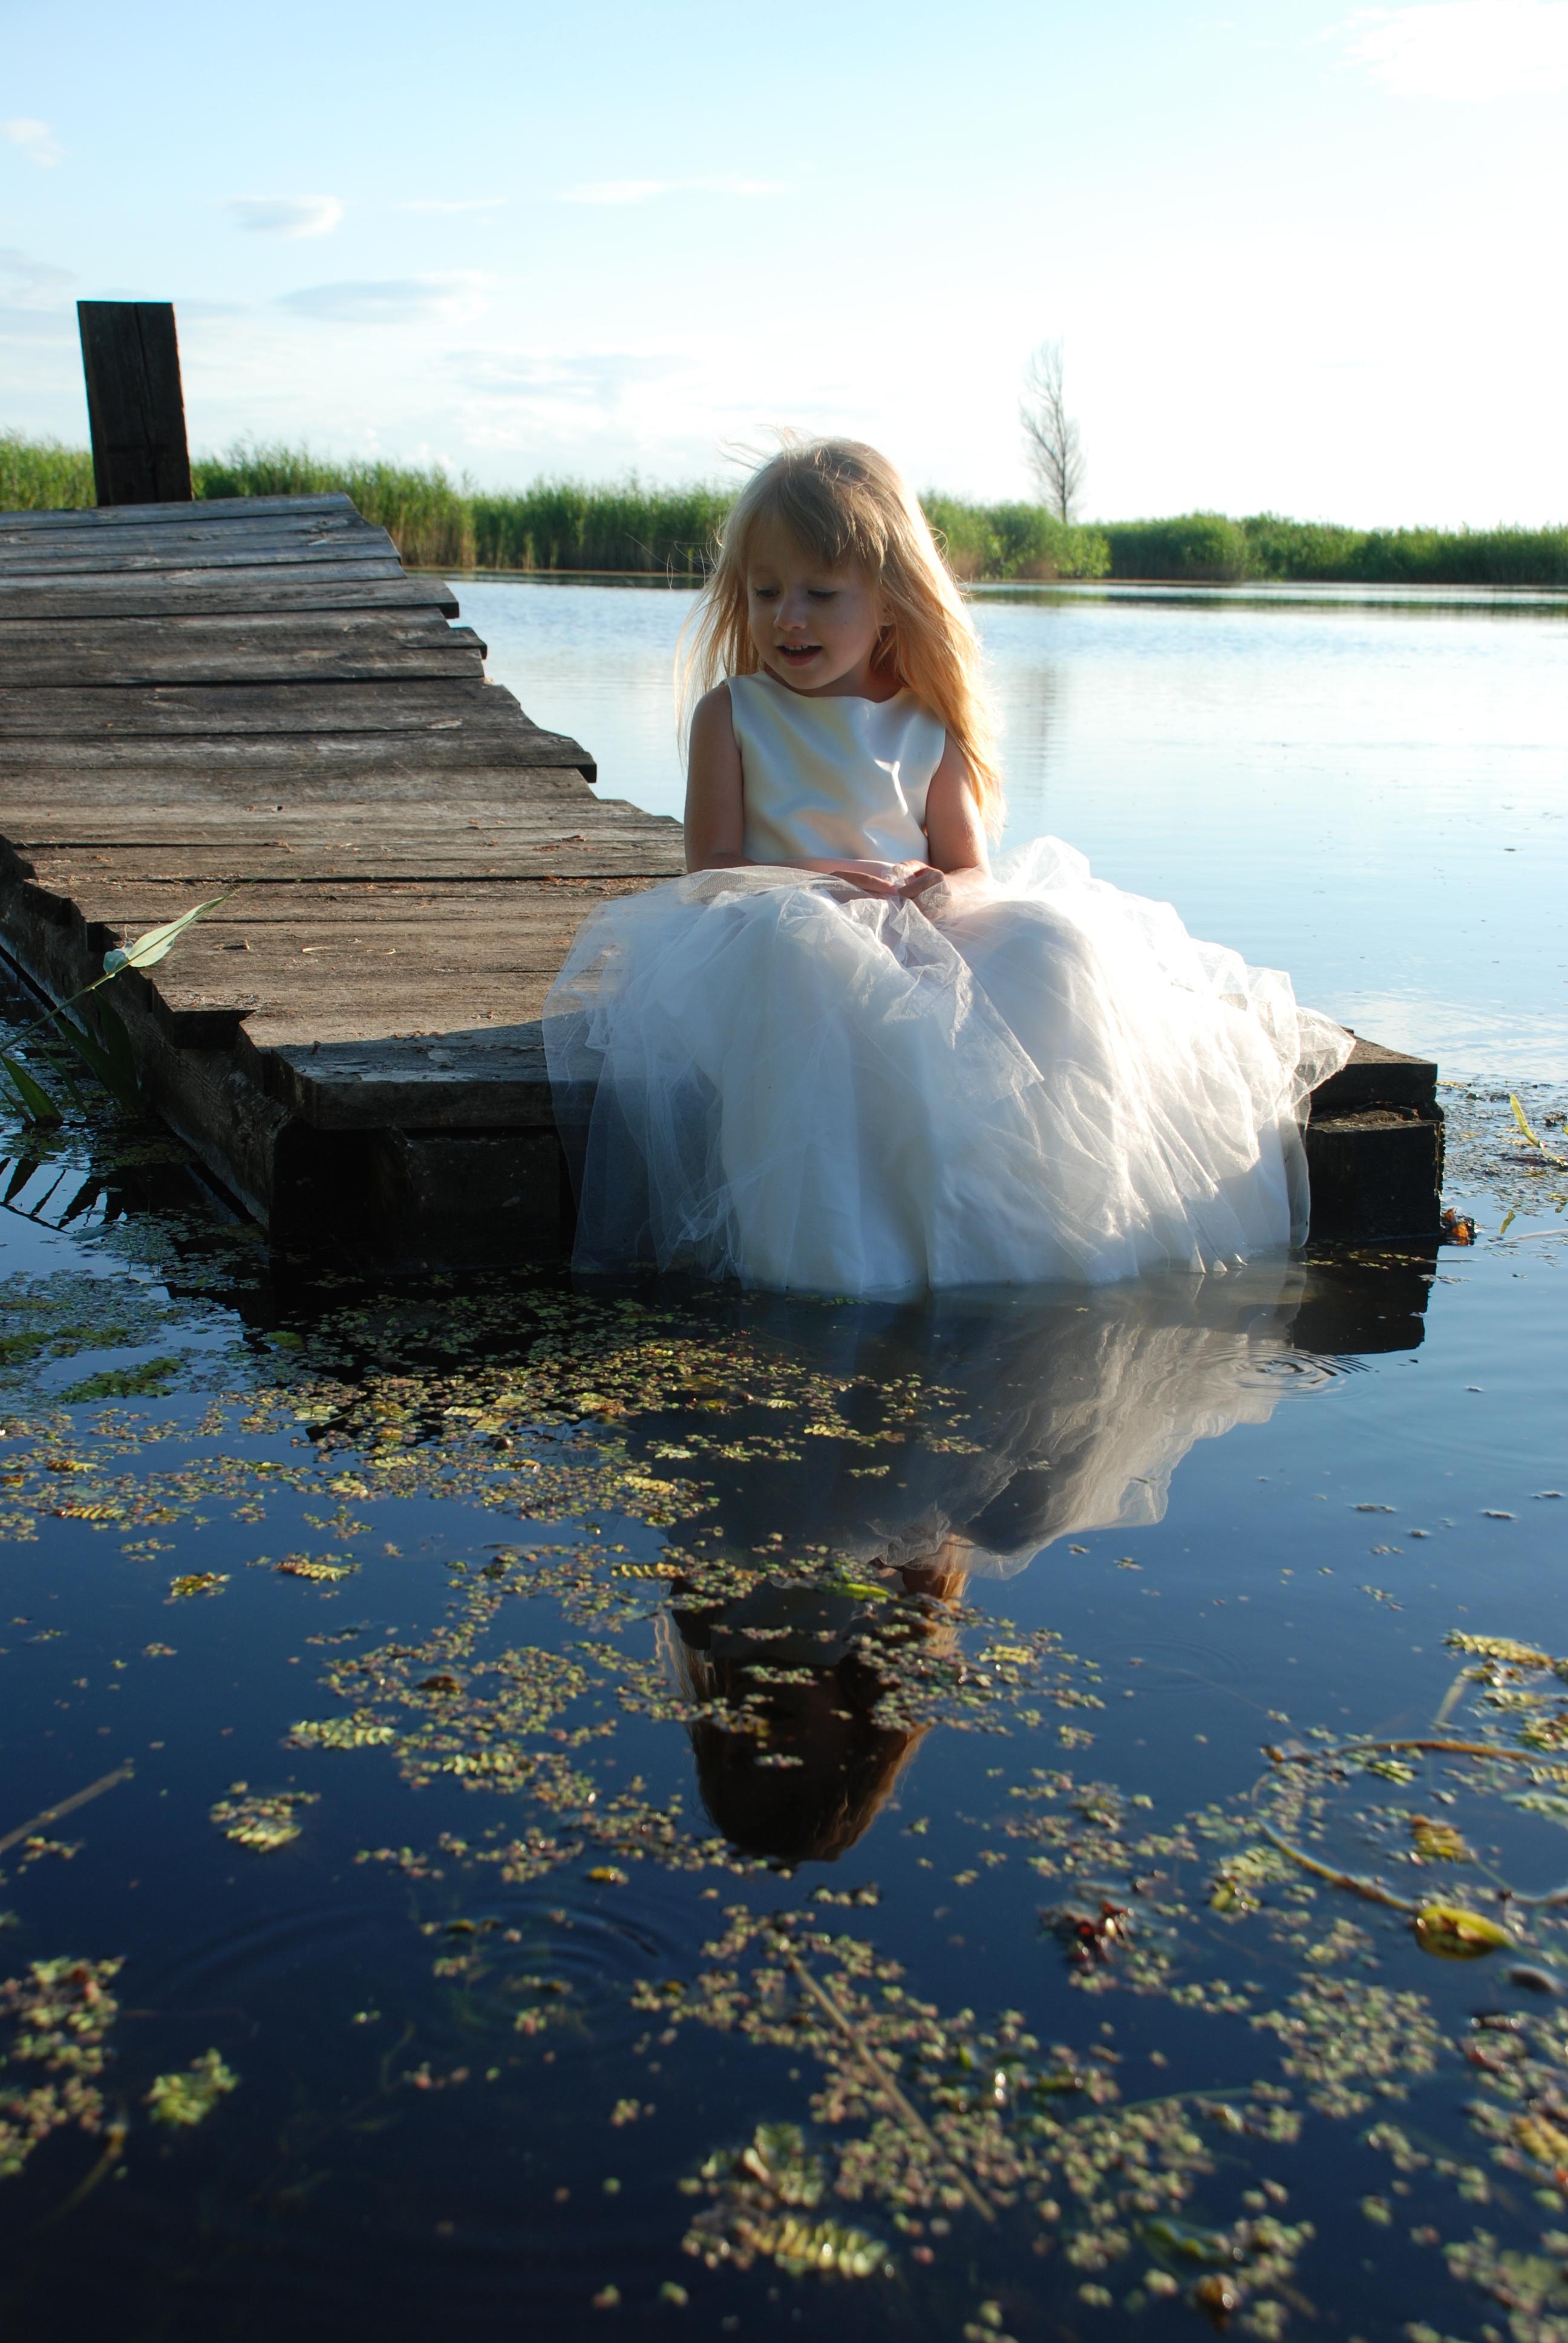 In the water_66 by anastasiya-landa